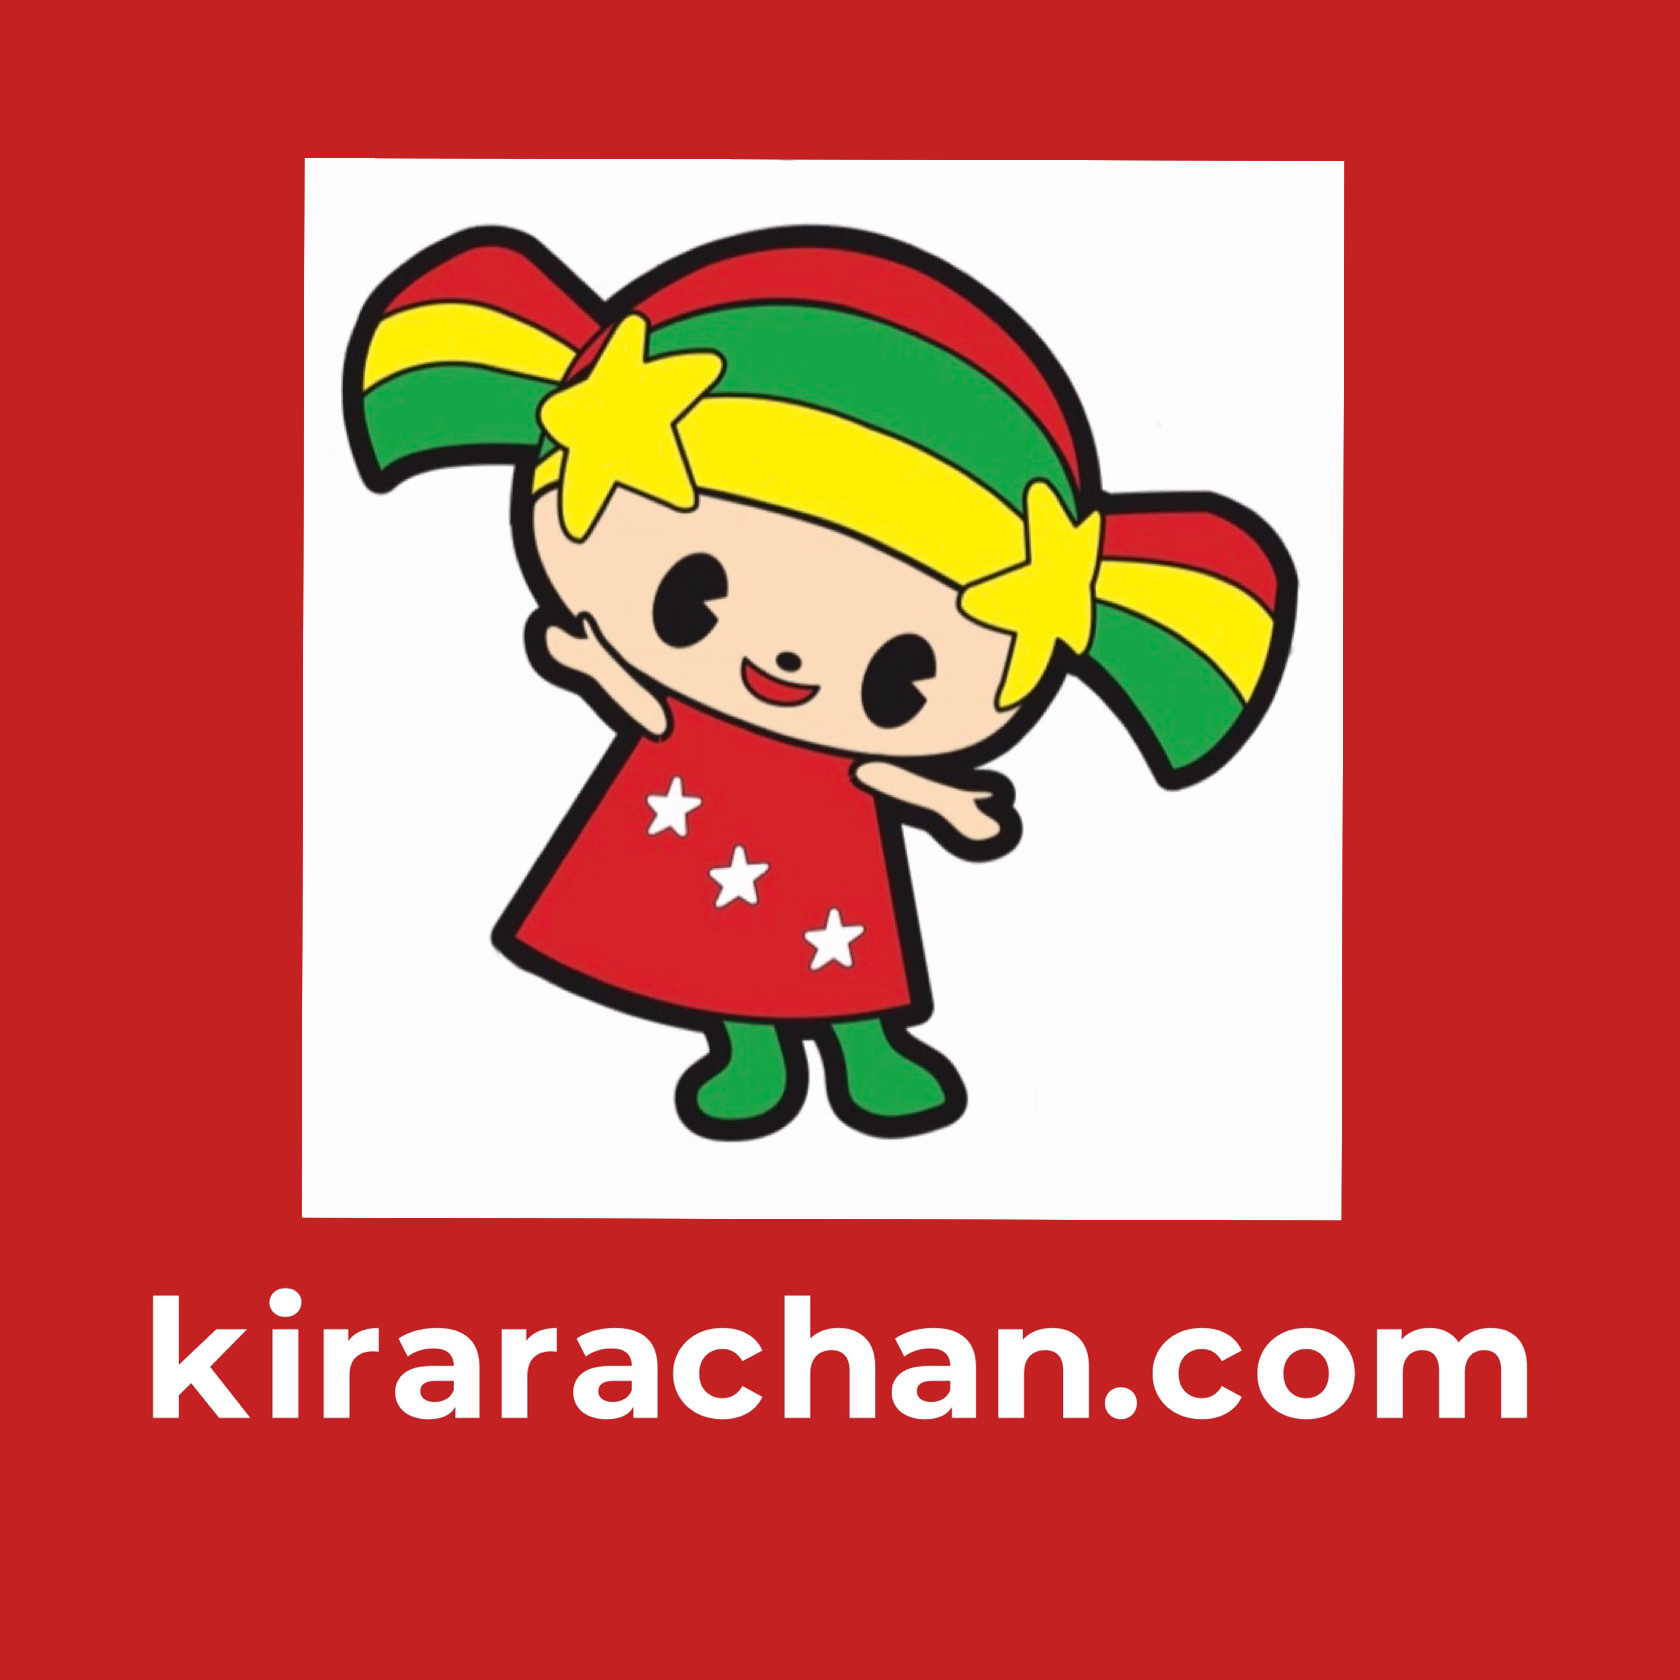 kirarachan.com